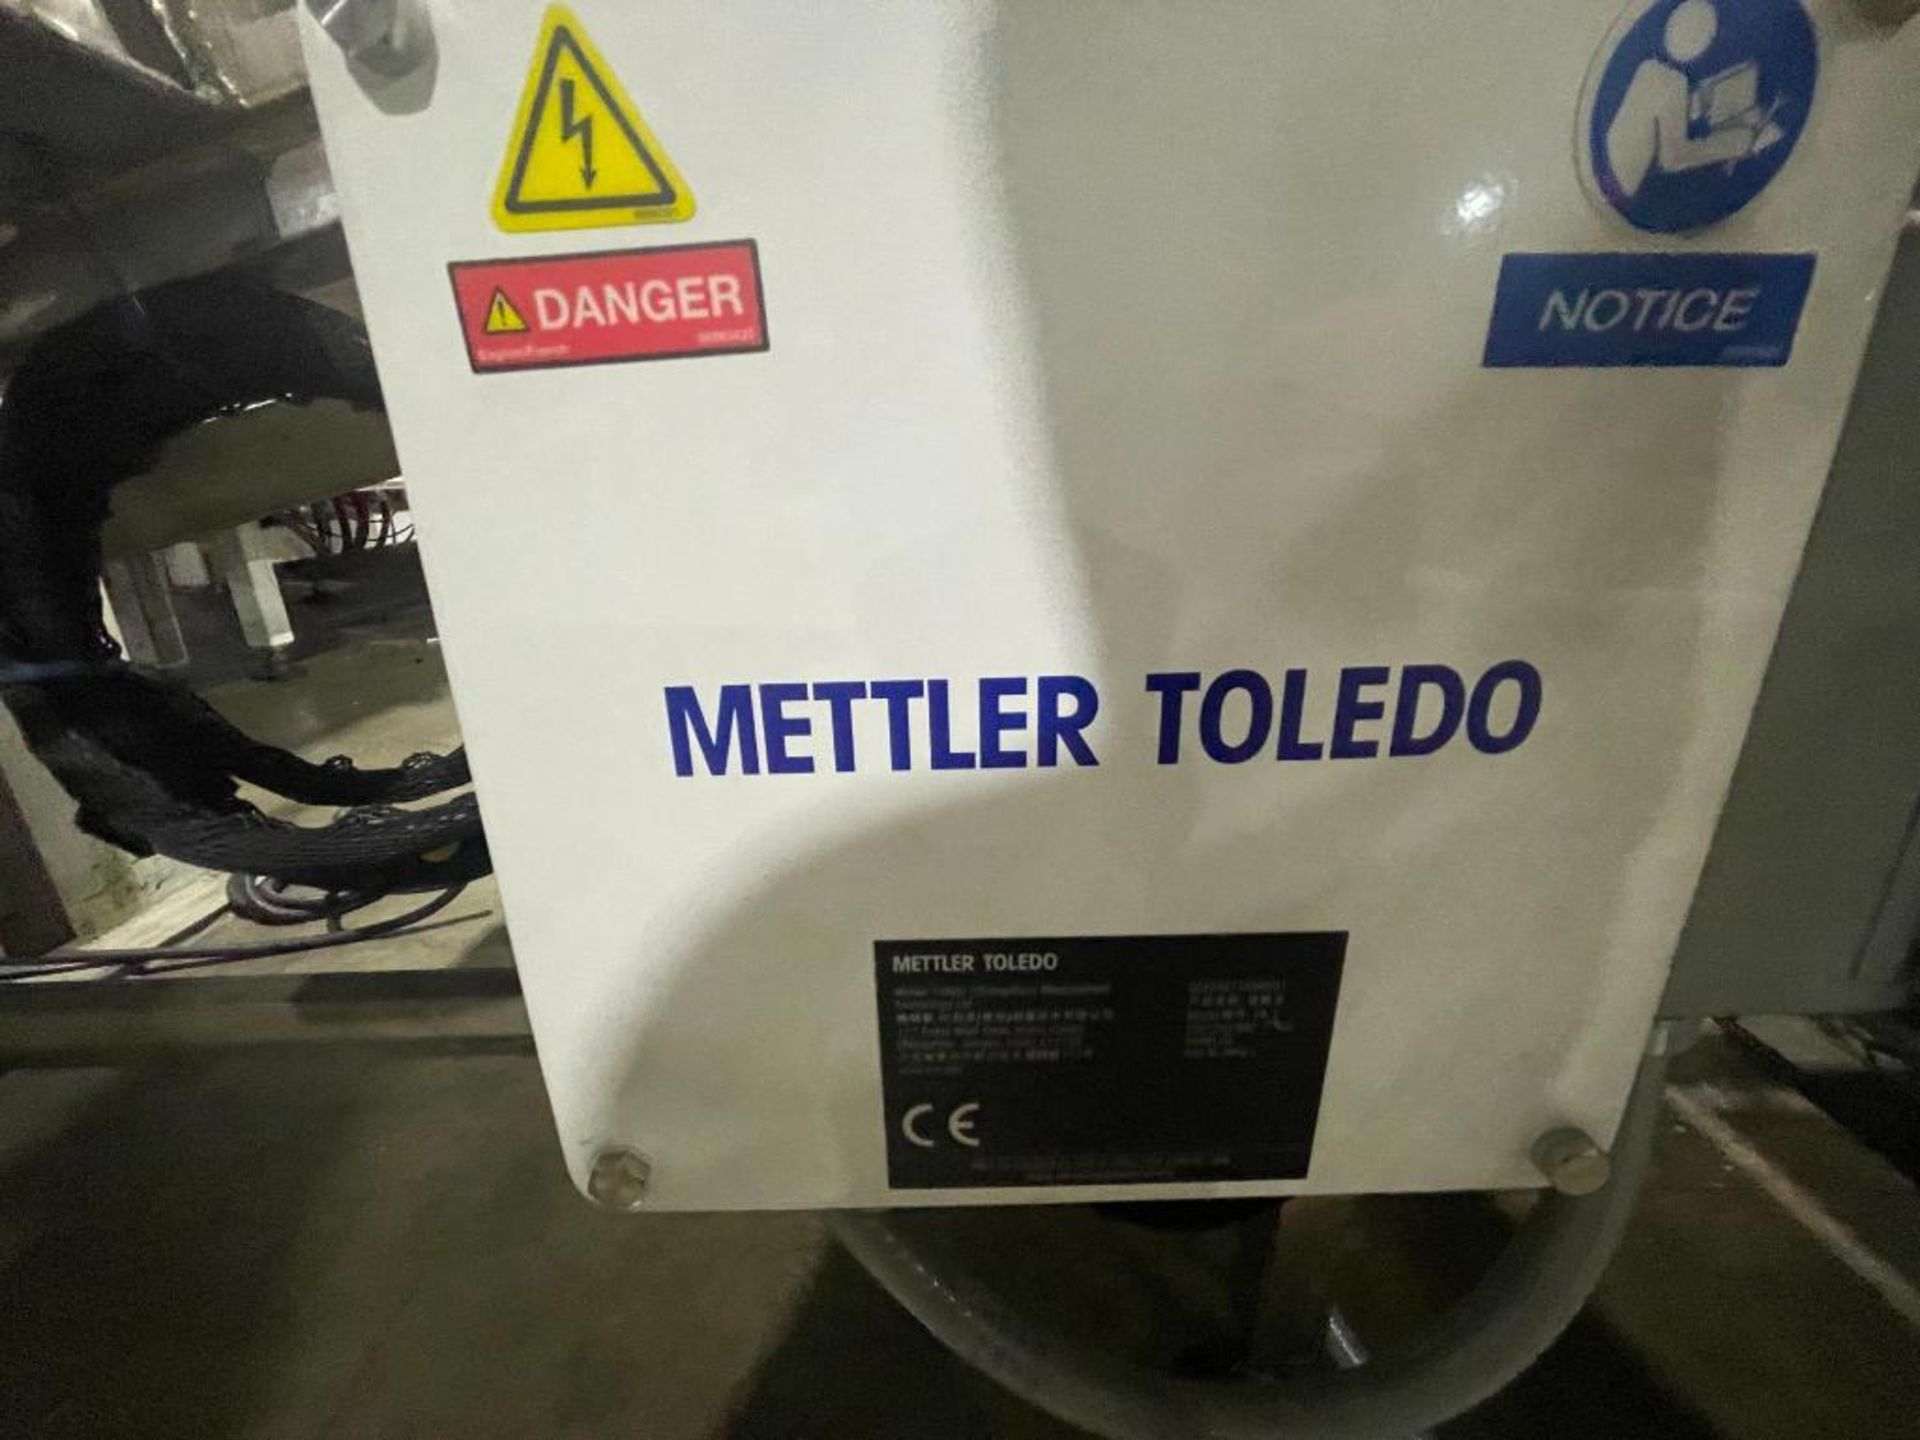 Mettler Toledo metal detector, model V4-1 - Image 2 of 14